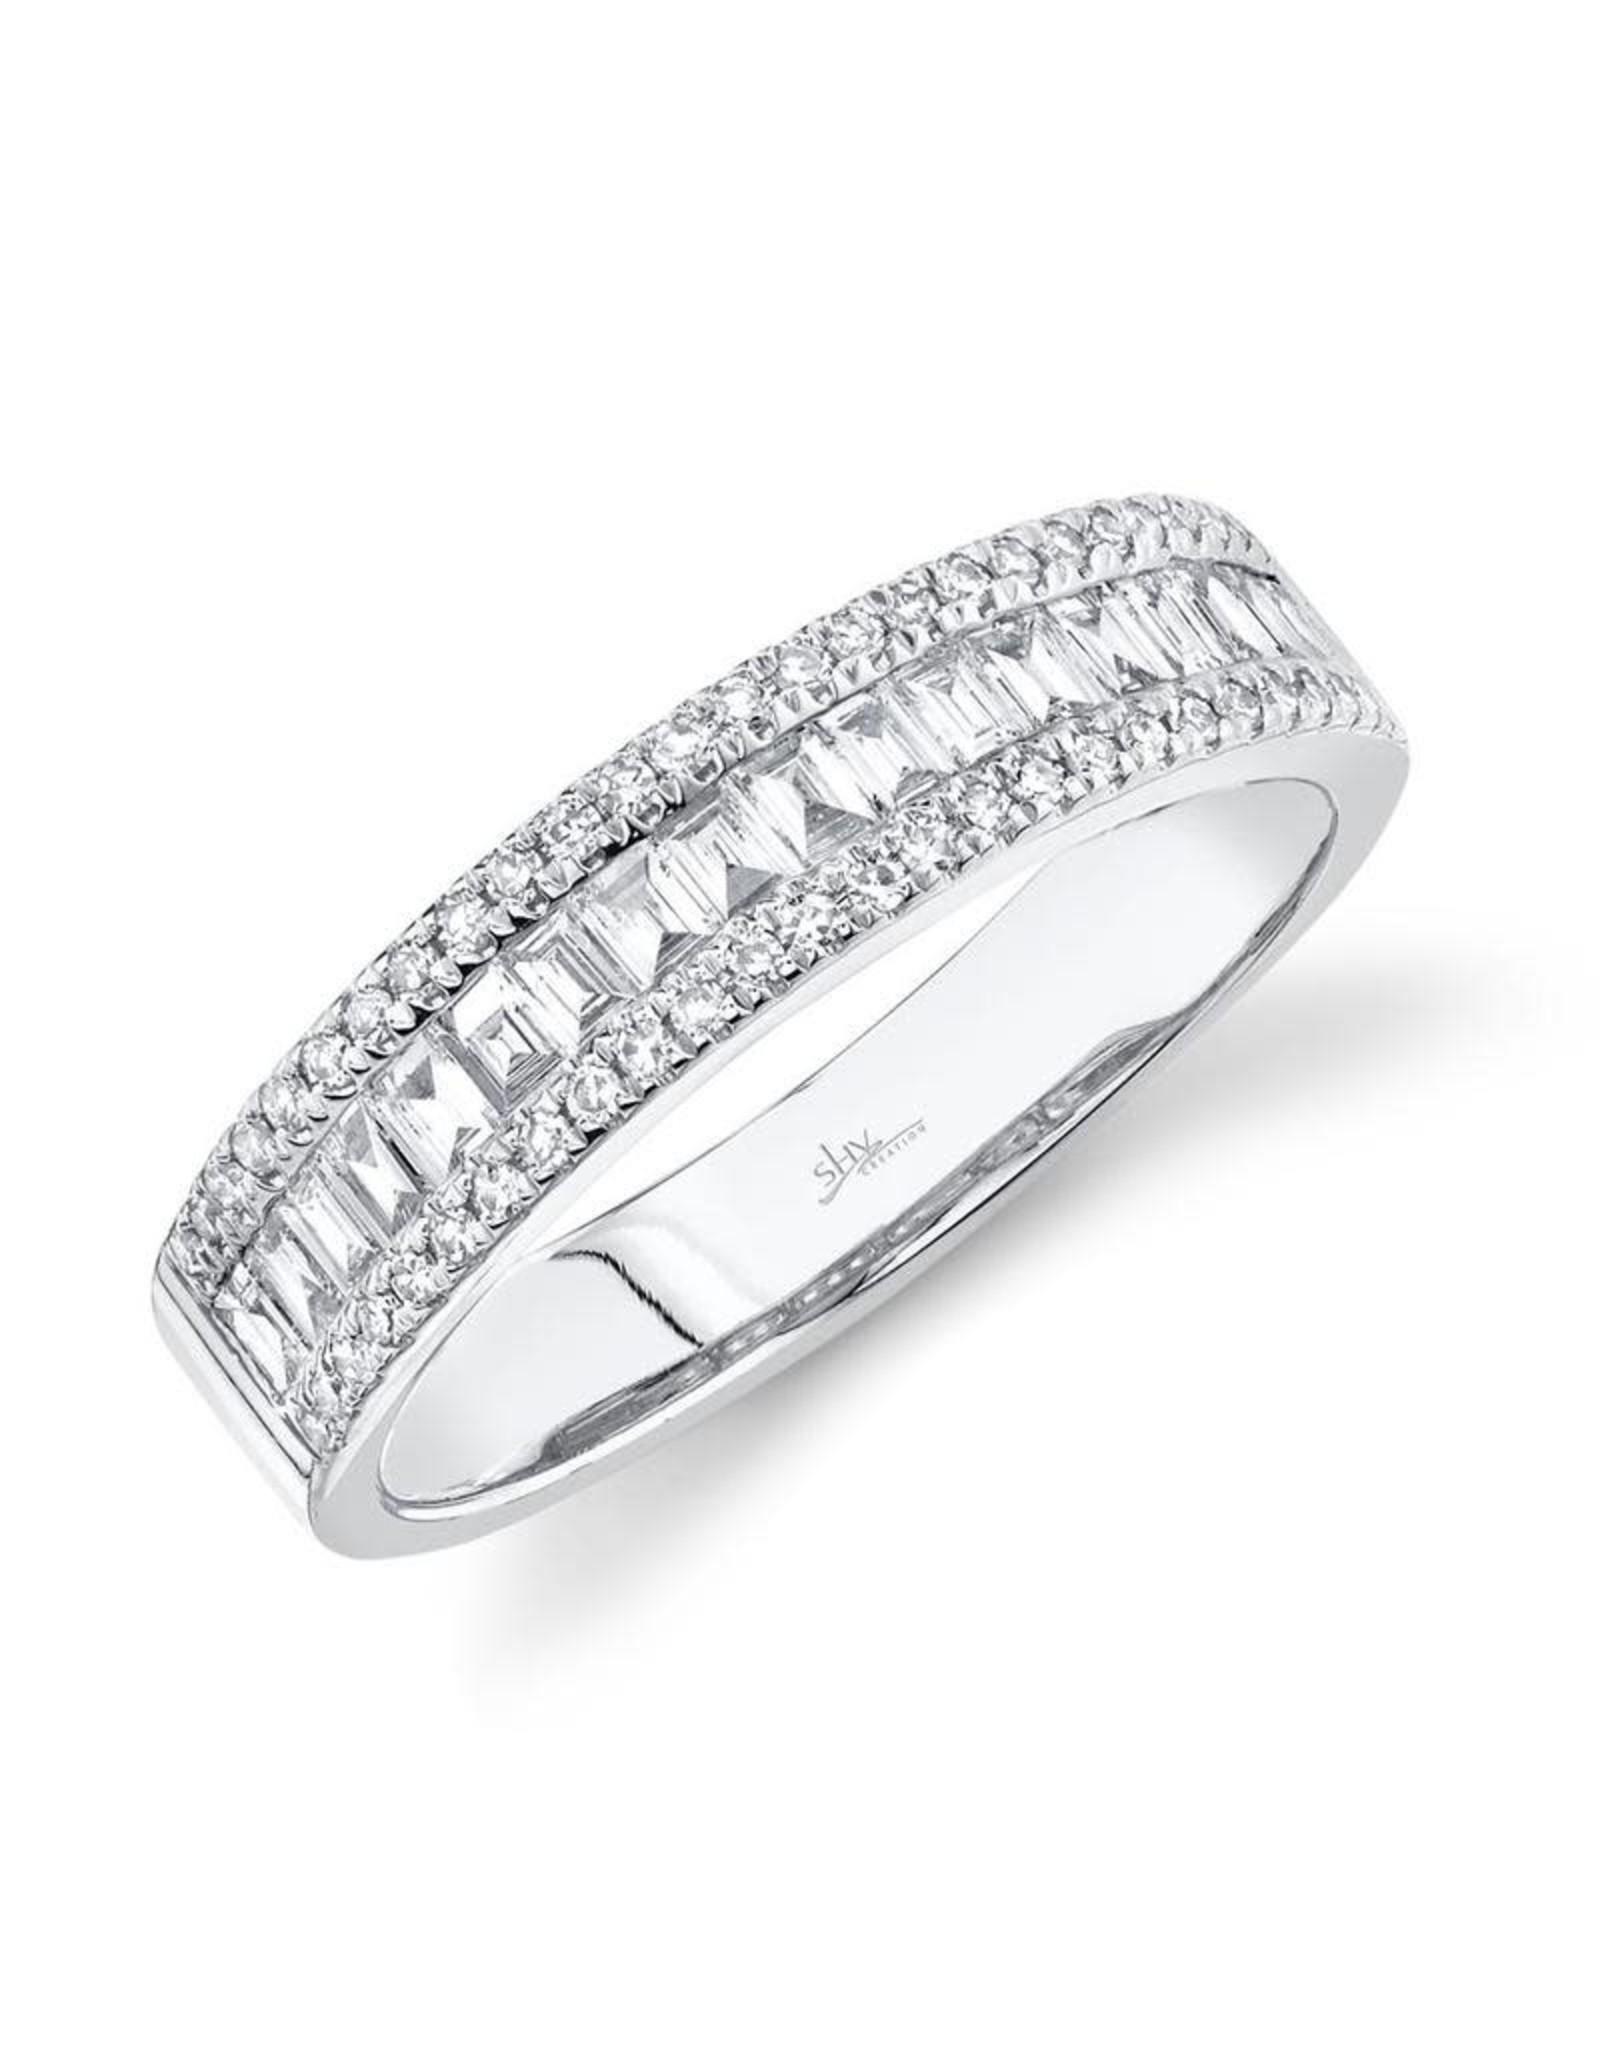 14K White Gold Baguette Diamond Band, D: 0.55ct